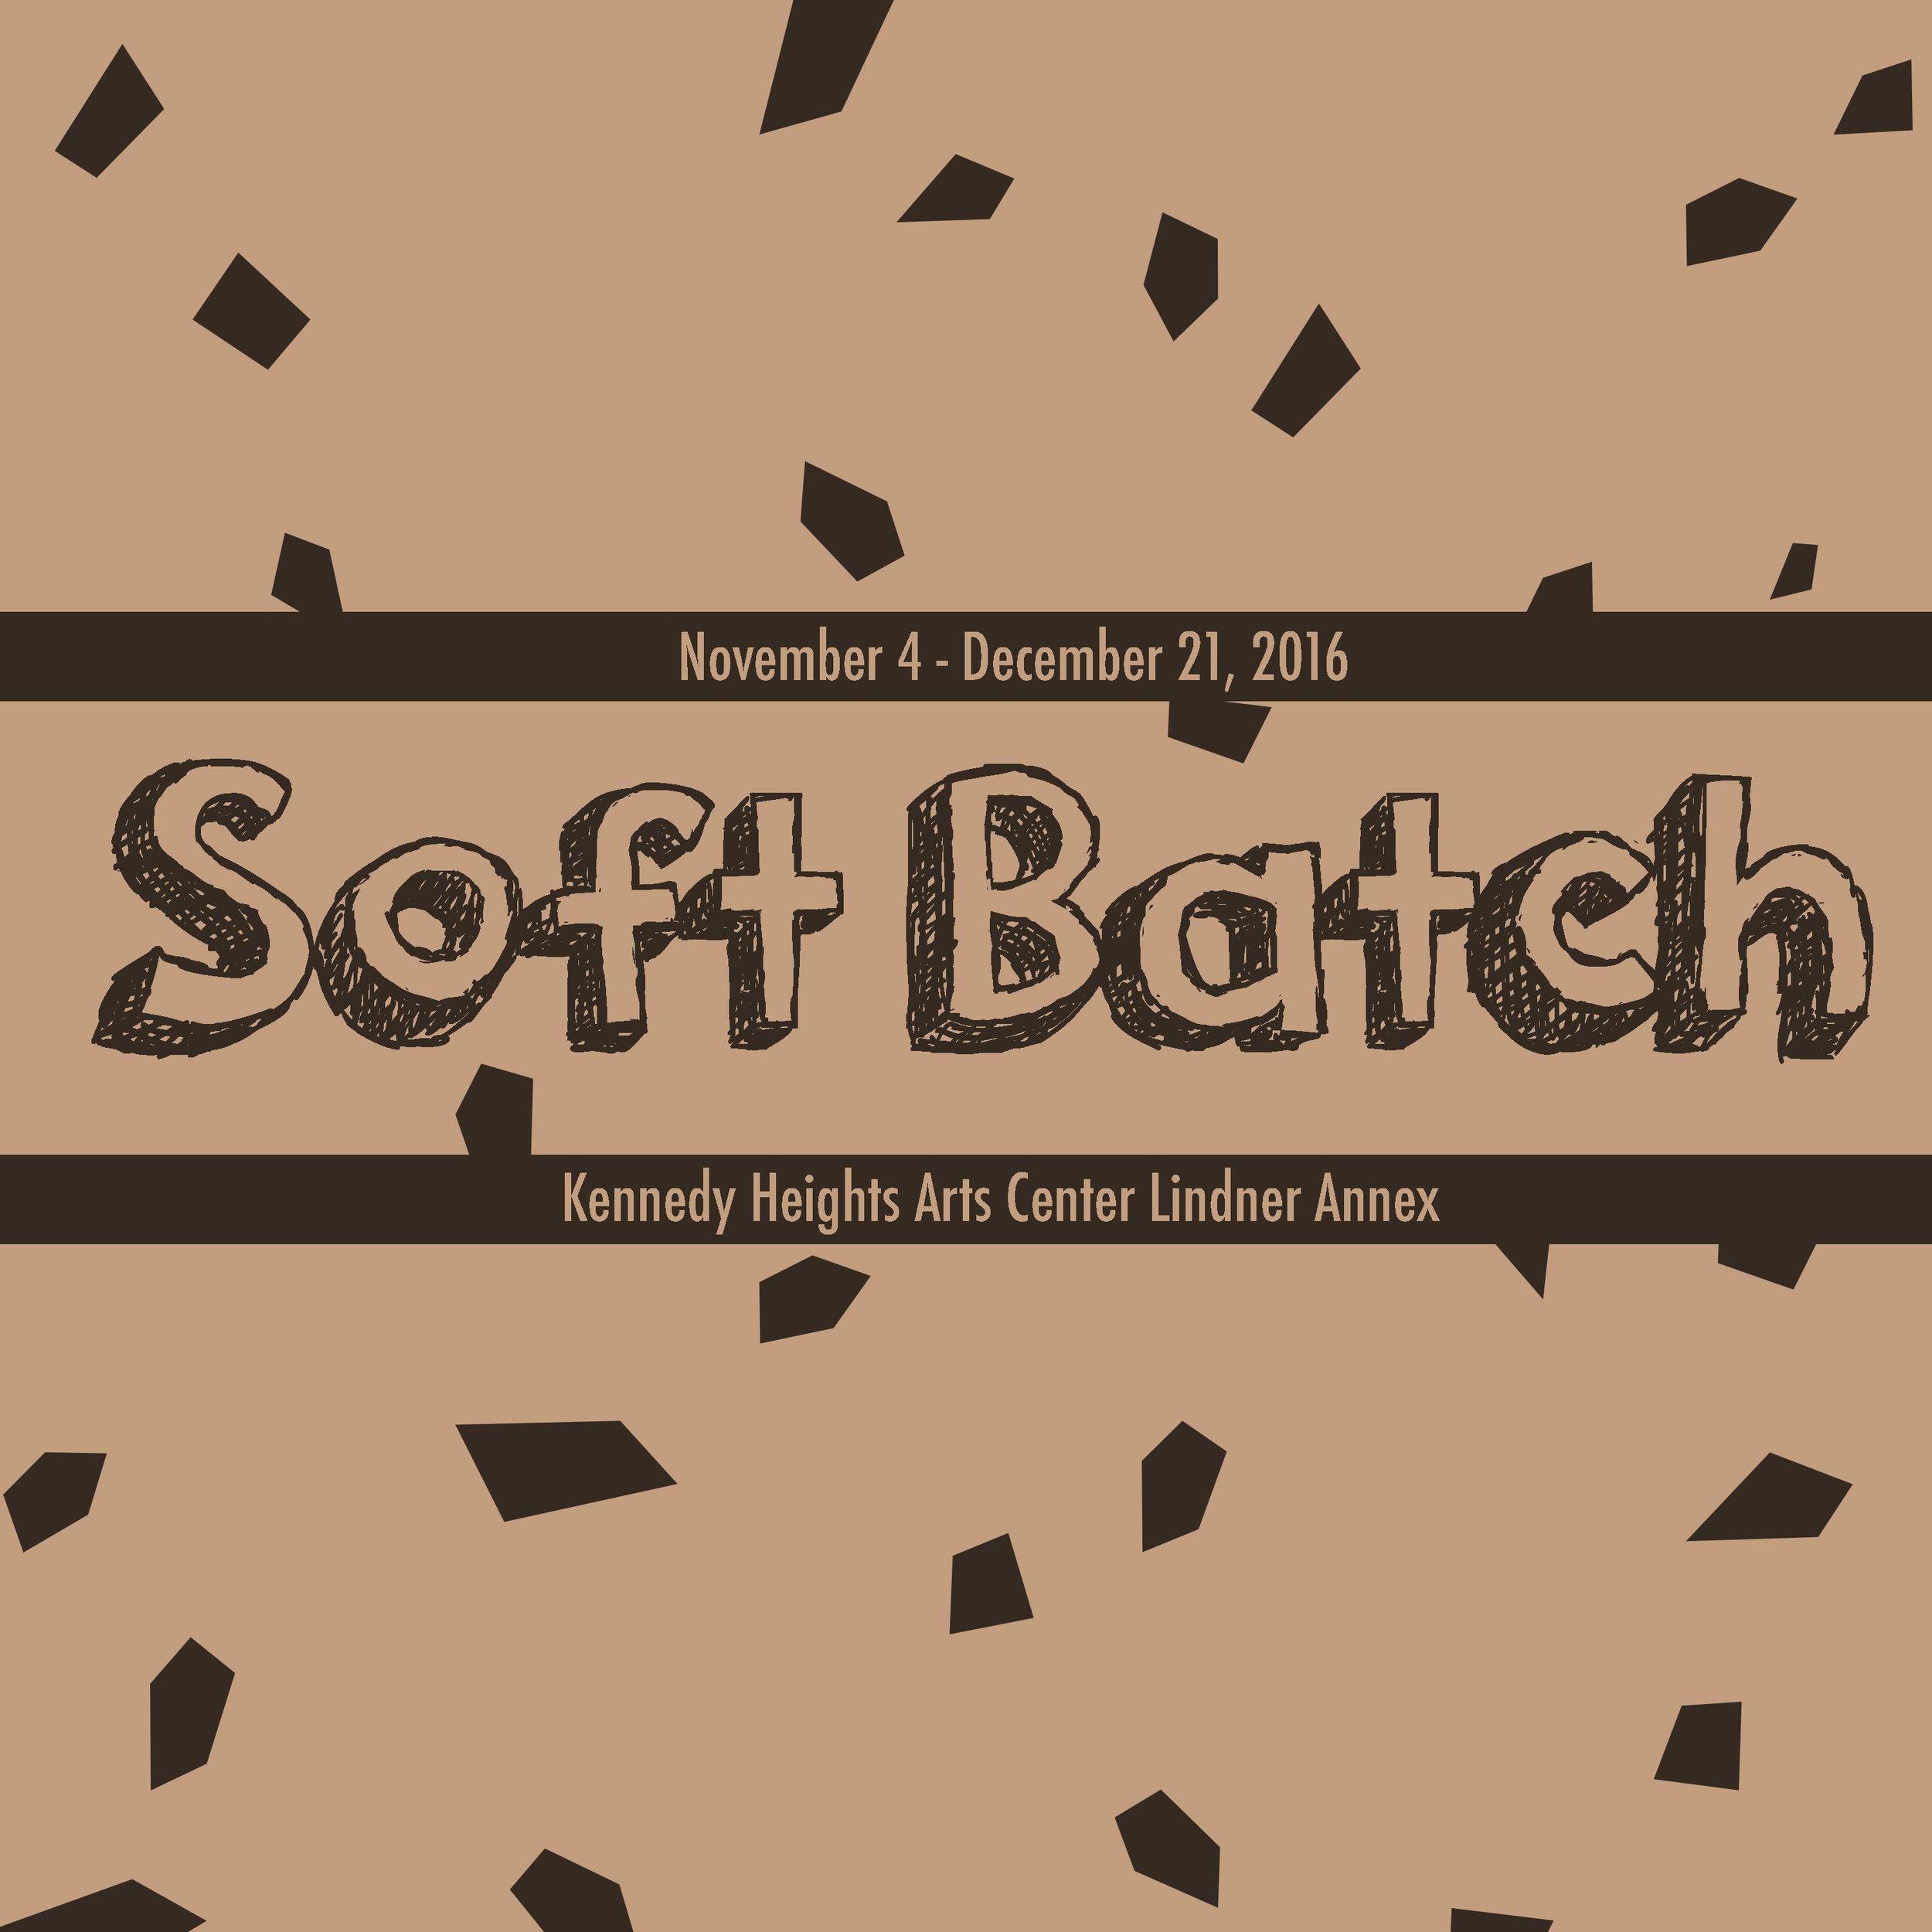 Soft Batch  November 4 - December 21, 2016  Kennedy Heights Arts Center Lindner Annex  6546 Montgomery Rd.  Cincinnati, OH 45213